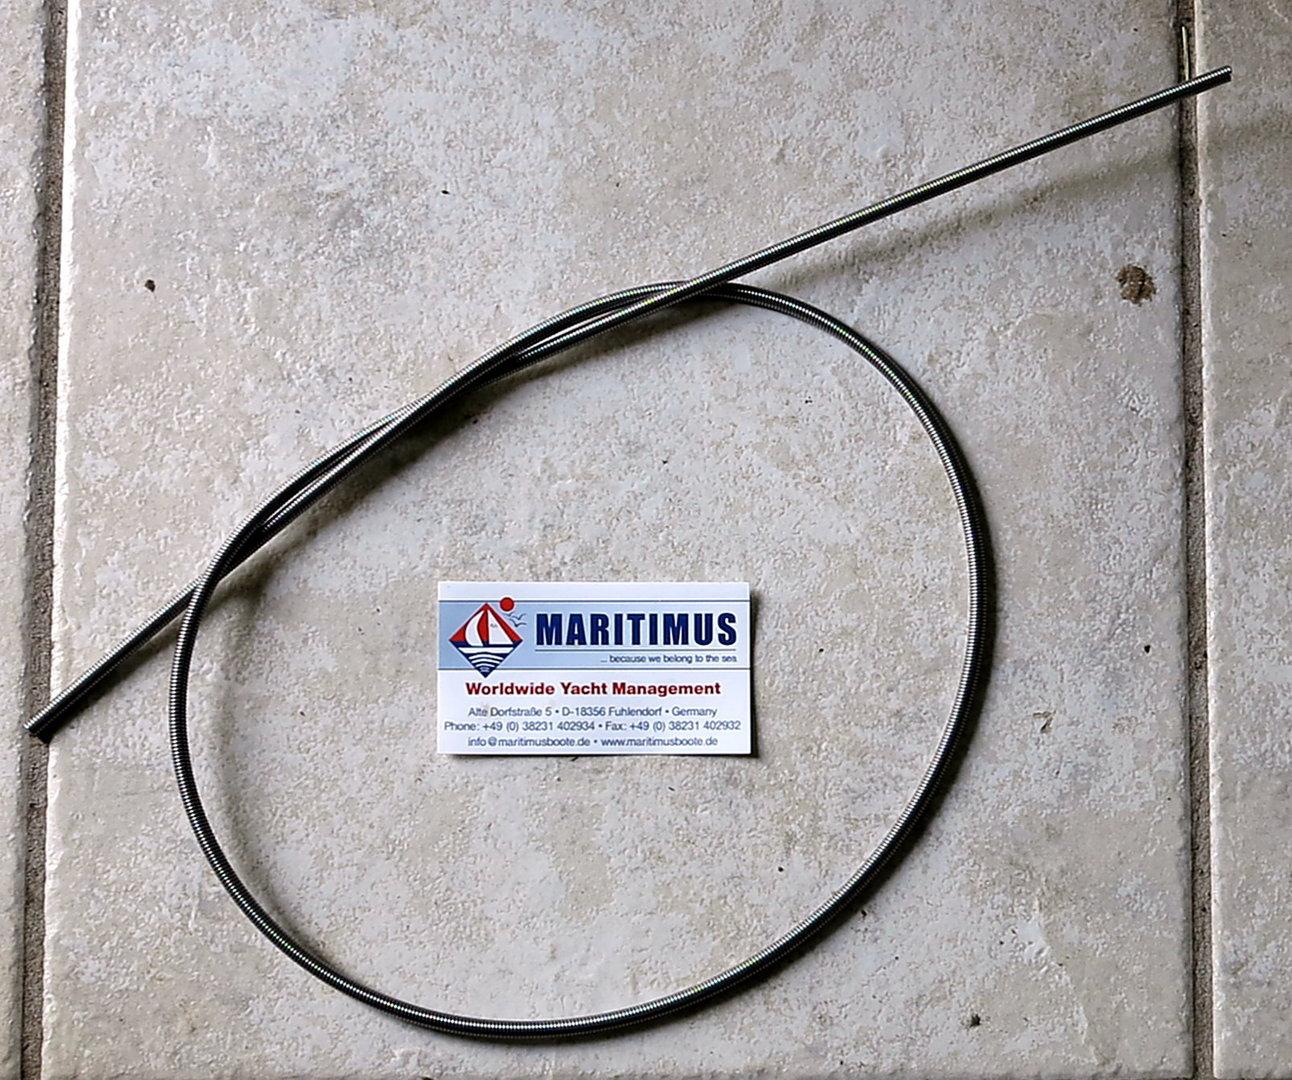 Liros Porto 16mm Festm schwarz // weiß 4900 daN BRL m//3,10€ // Anker Leine